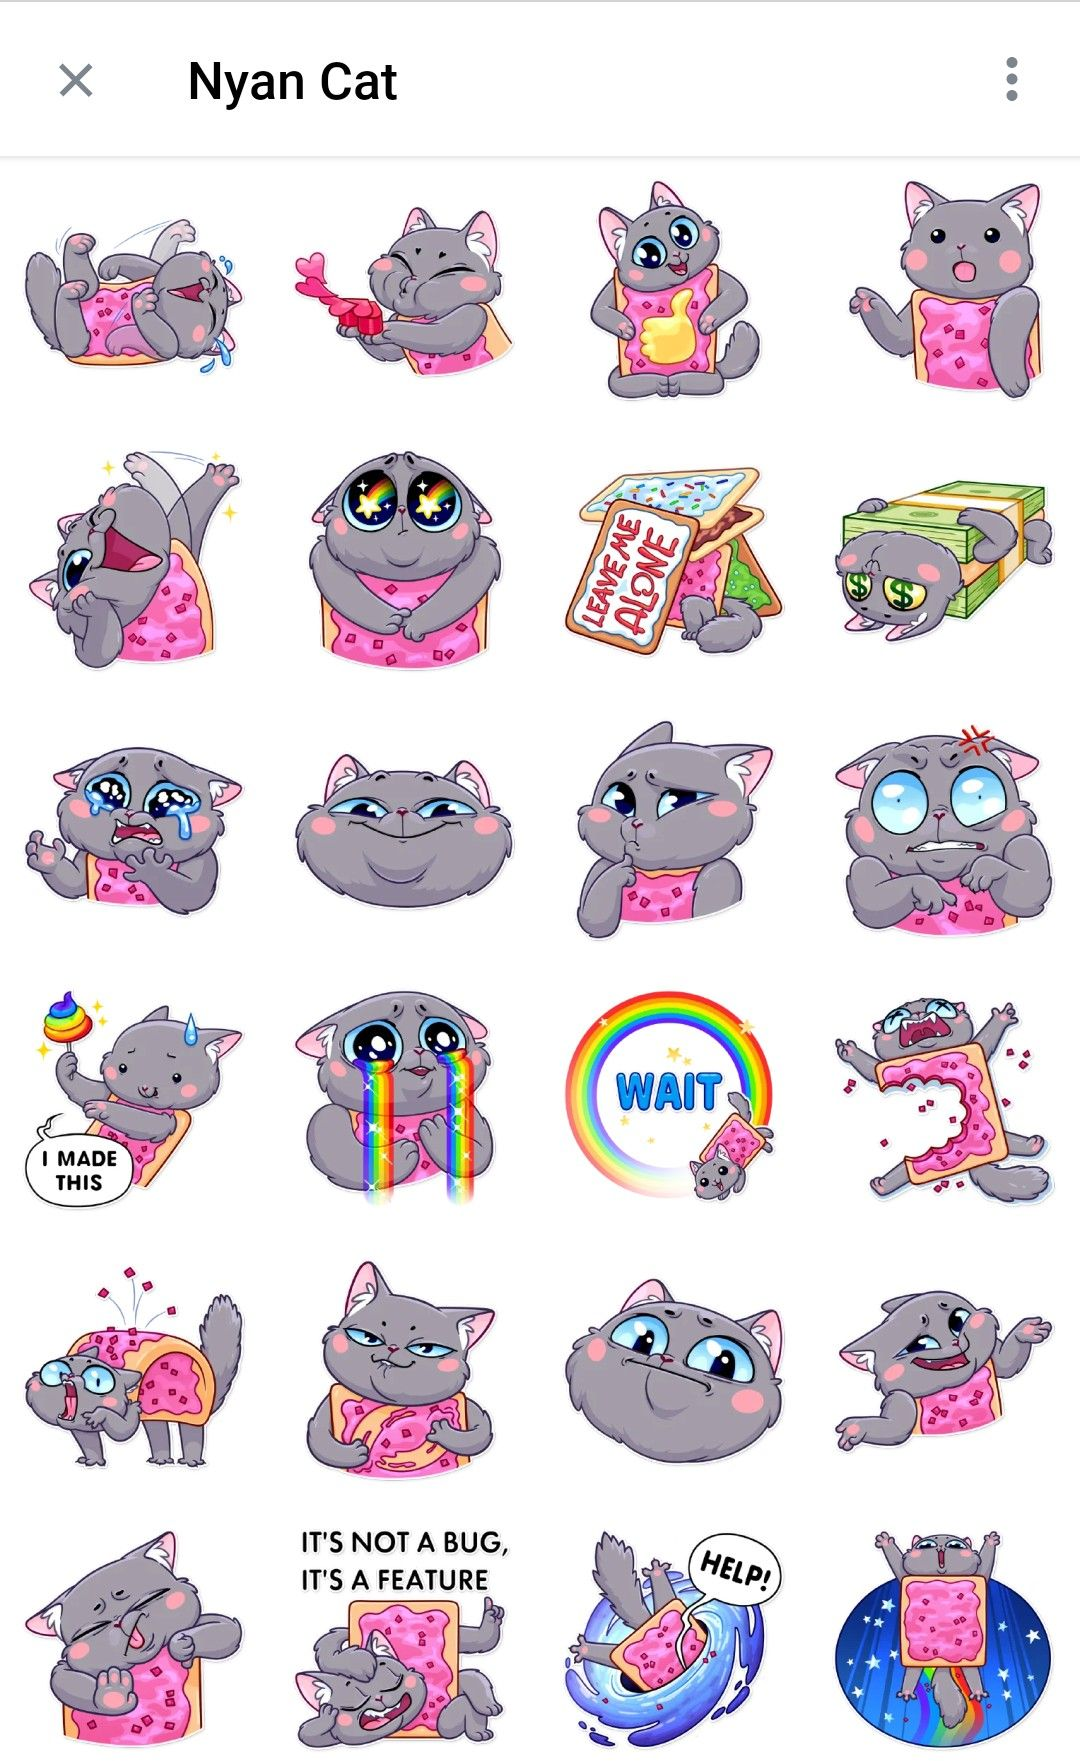 Nyan Cat Telegram sticker packs Nyan cat, Cute stickers